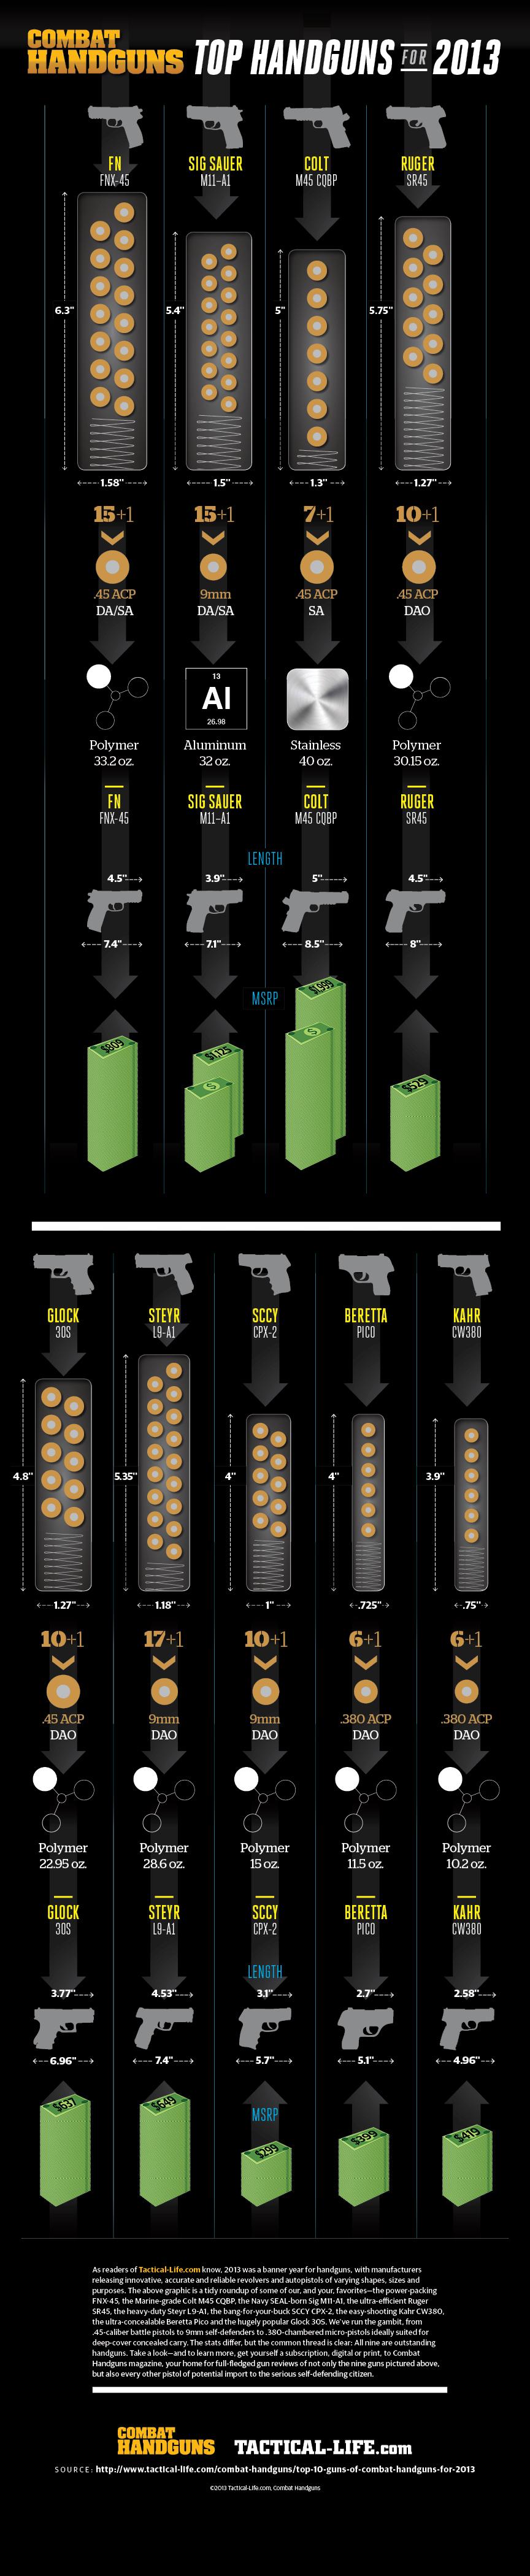 Combat Handguns Top Handguns of 2013 Infographic